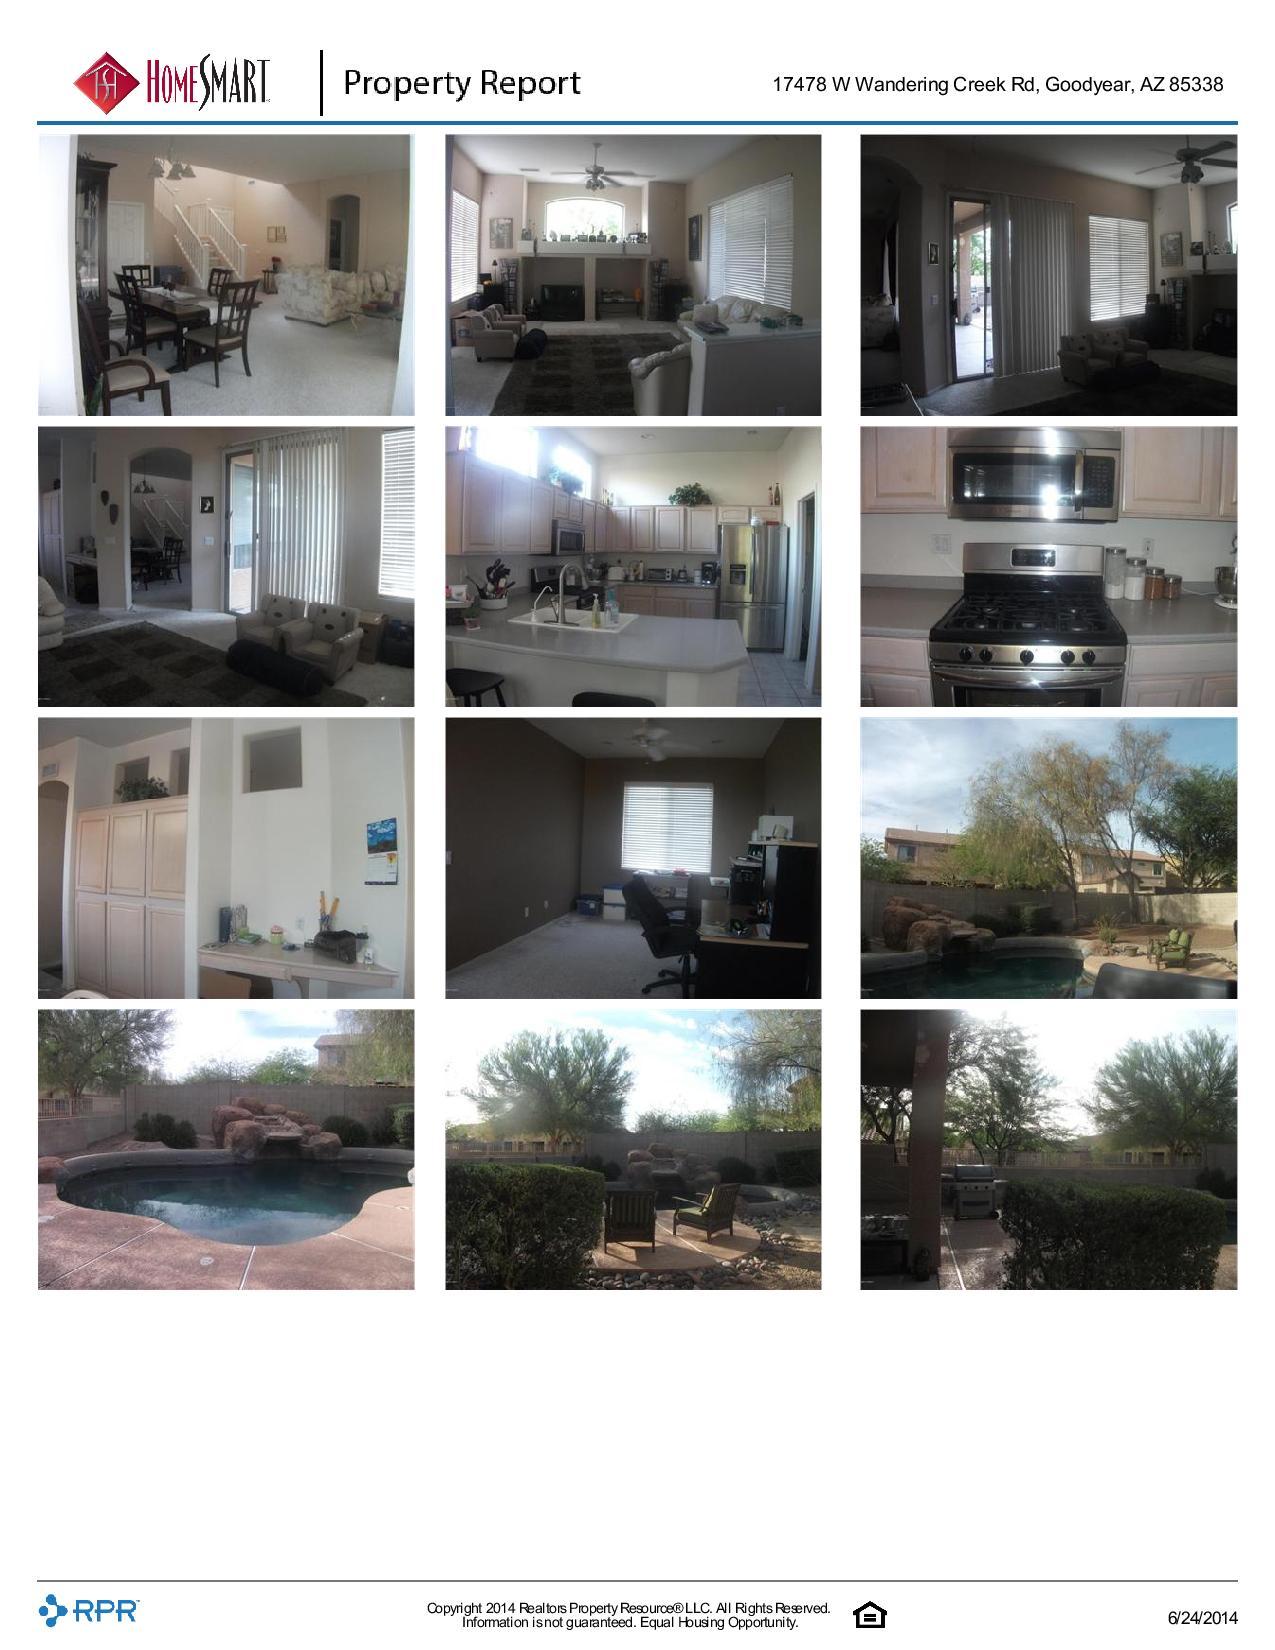 17478-W-Wandering-Creek-Rd-Goodyear-AZ-85338-page-006